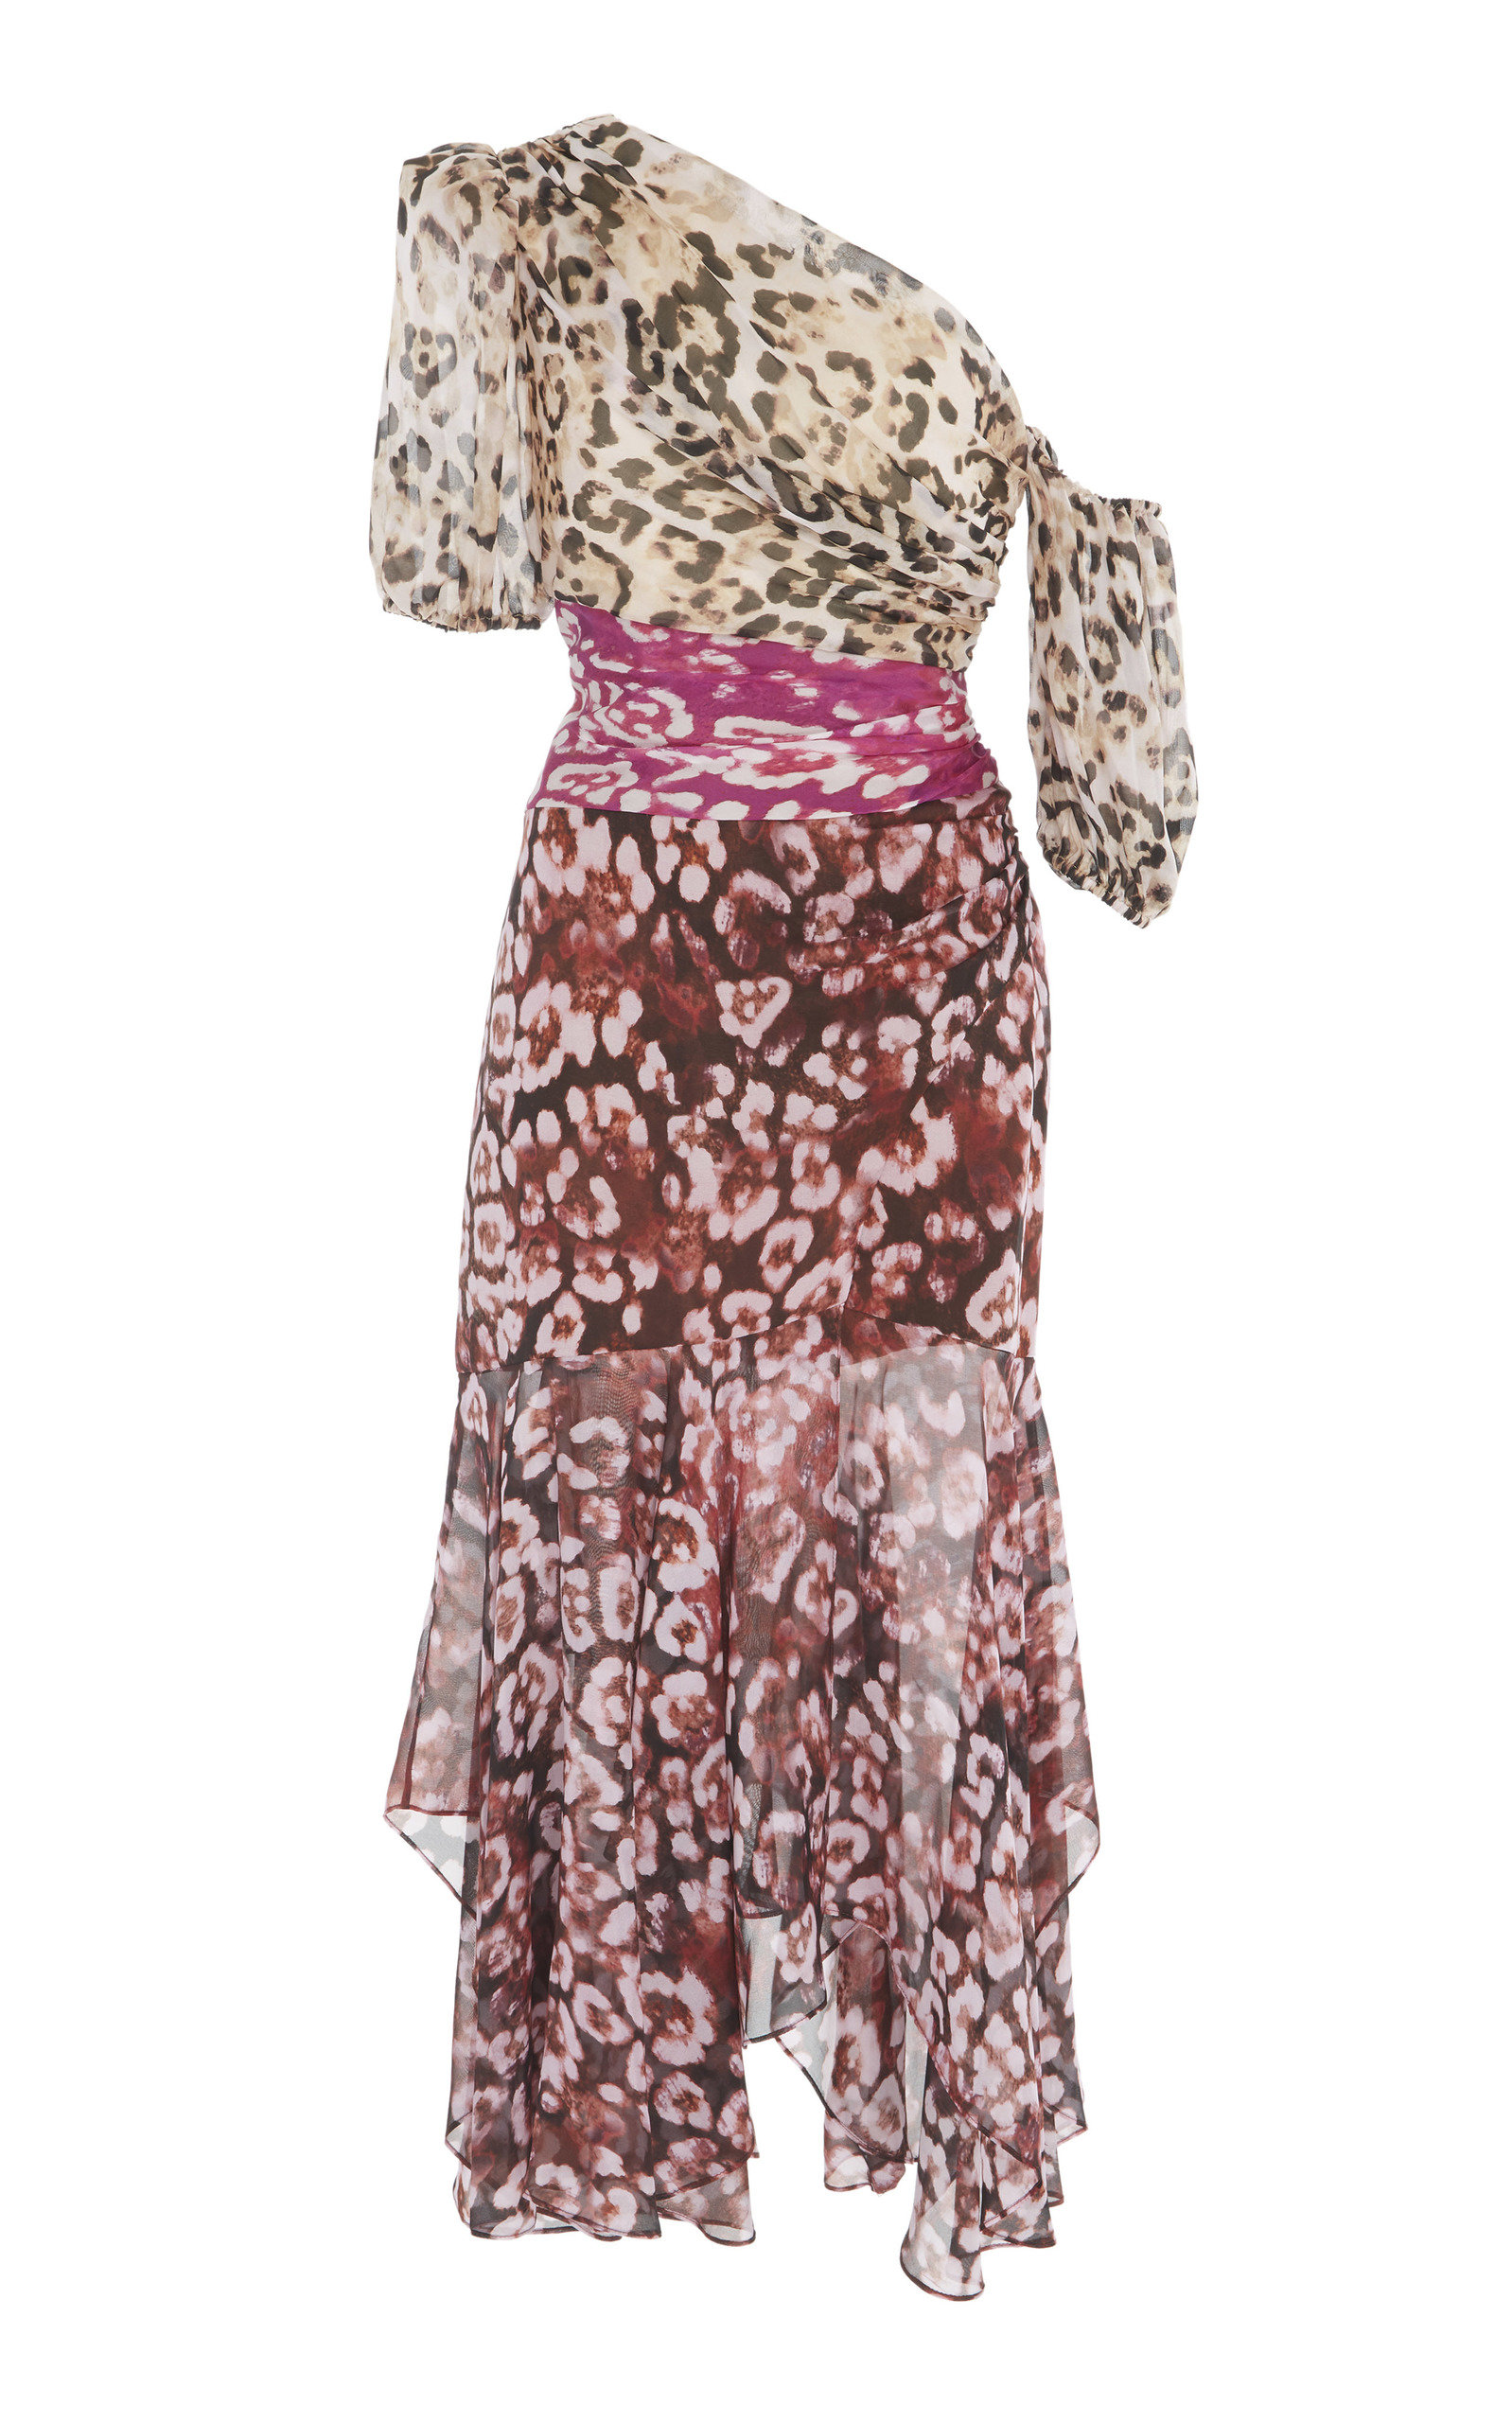 cdb62f9567 AMURJaylah One-Shoulder Printed Silk-Chiffon Midi Dress. CLOSE. Loading